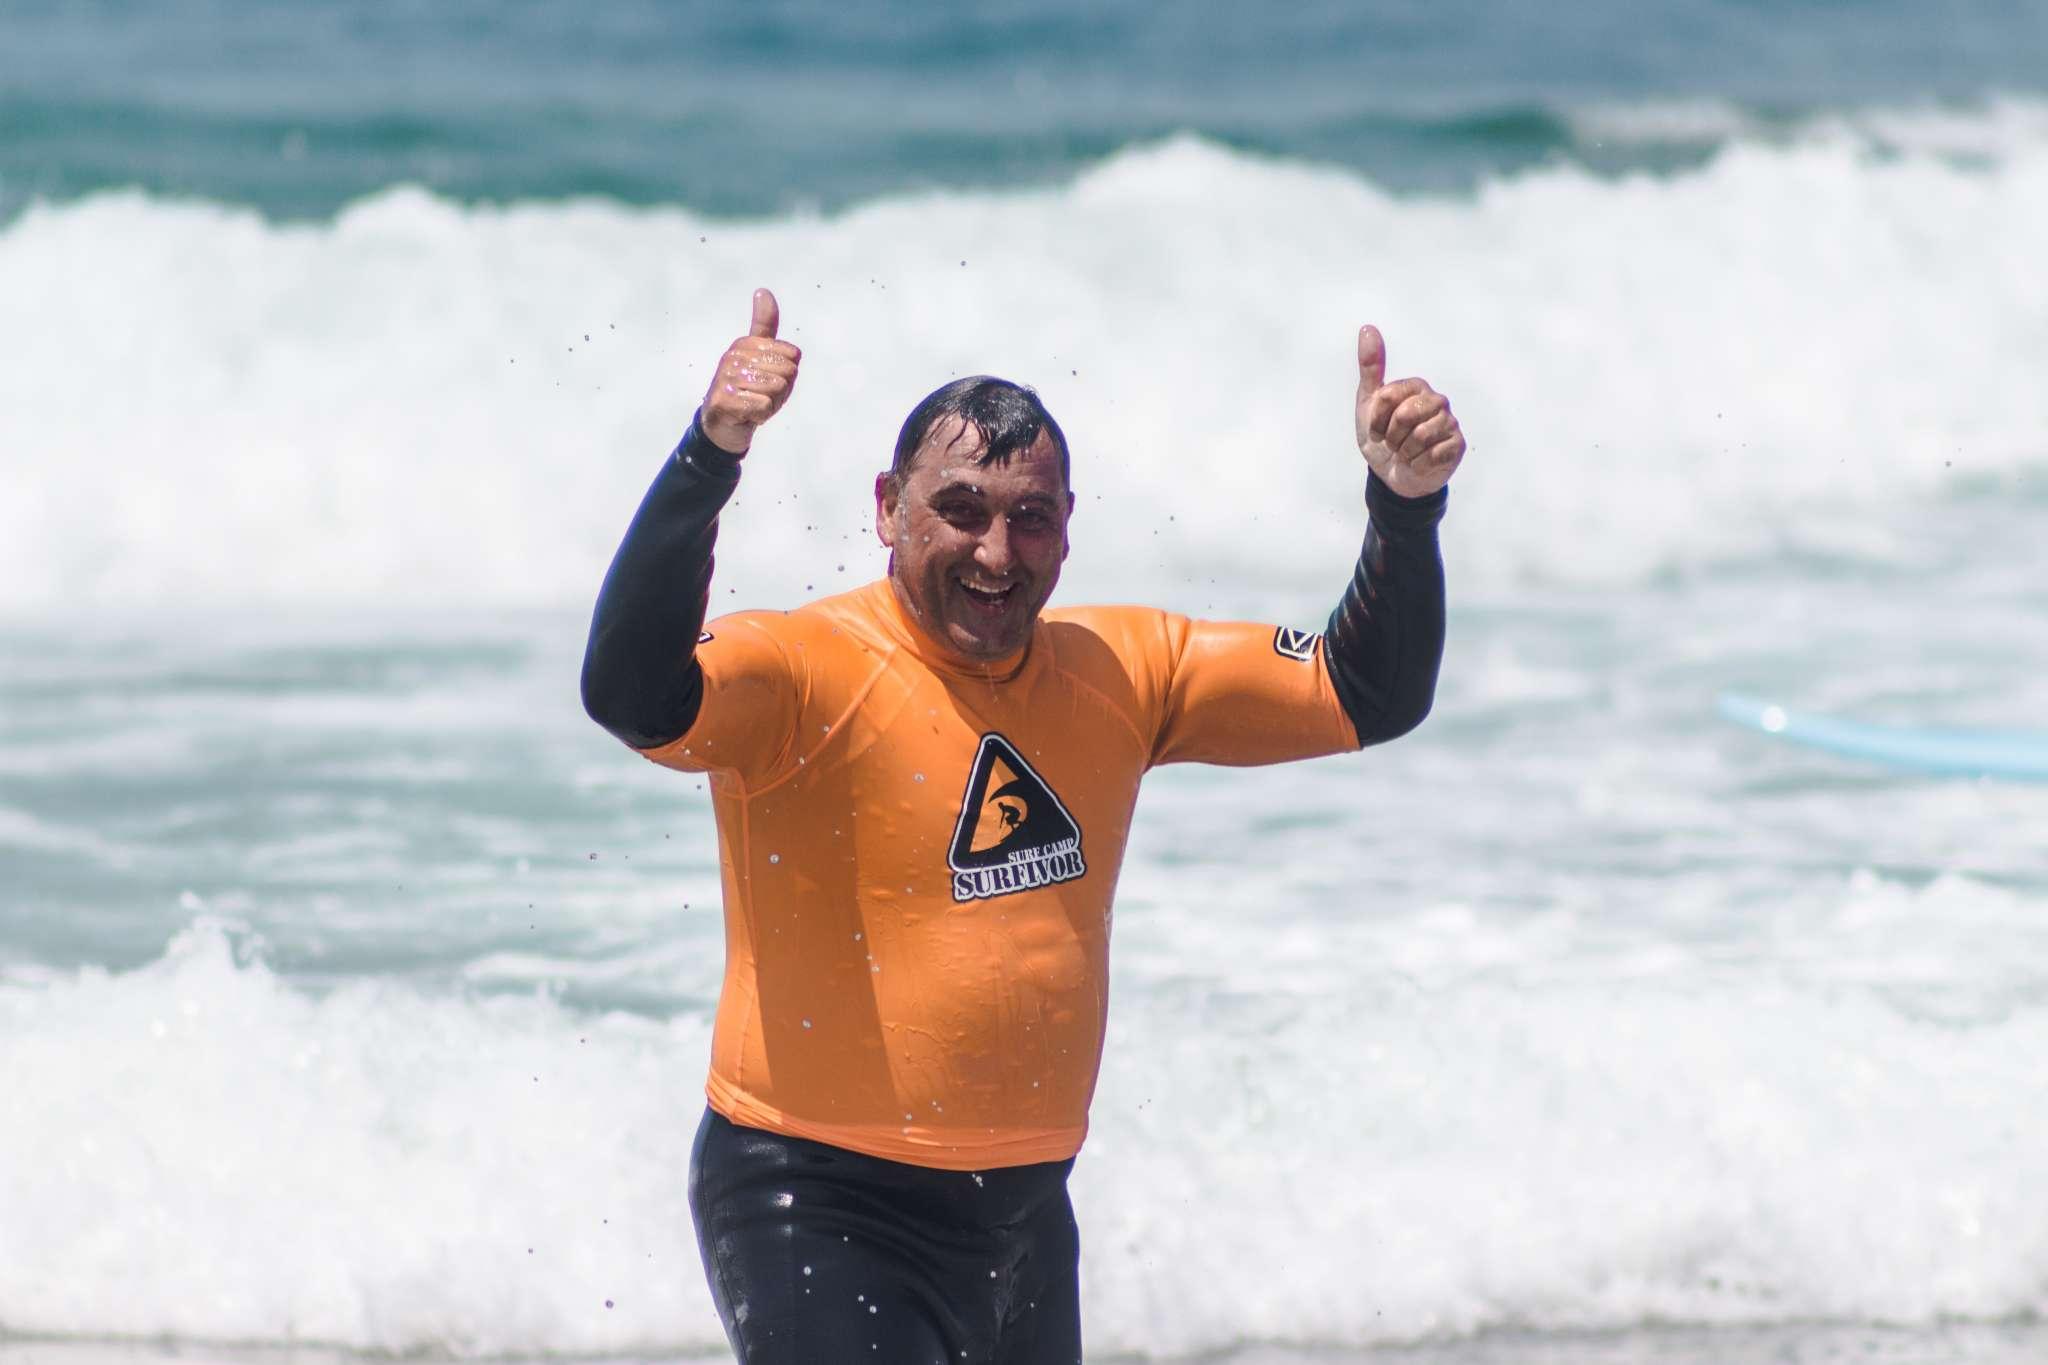 Surfivor Family Surf Holidays